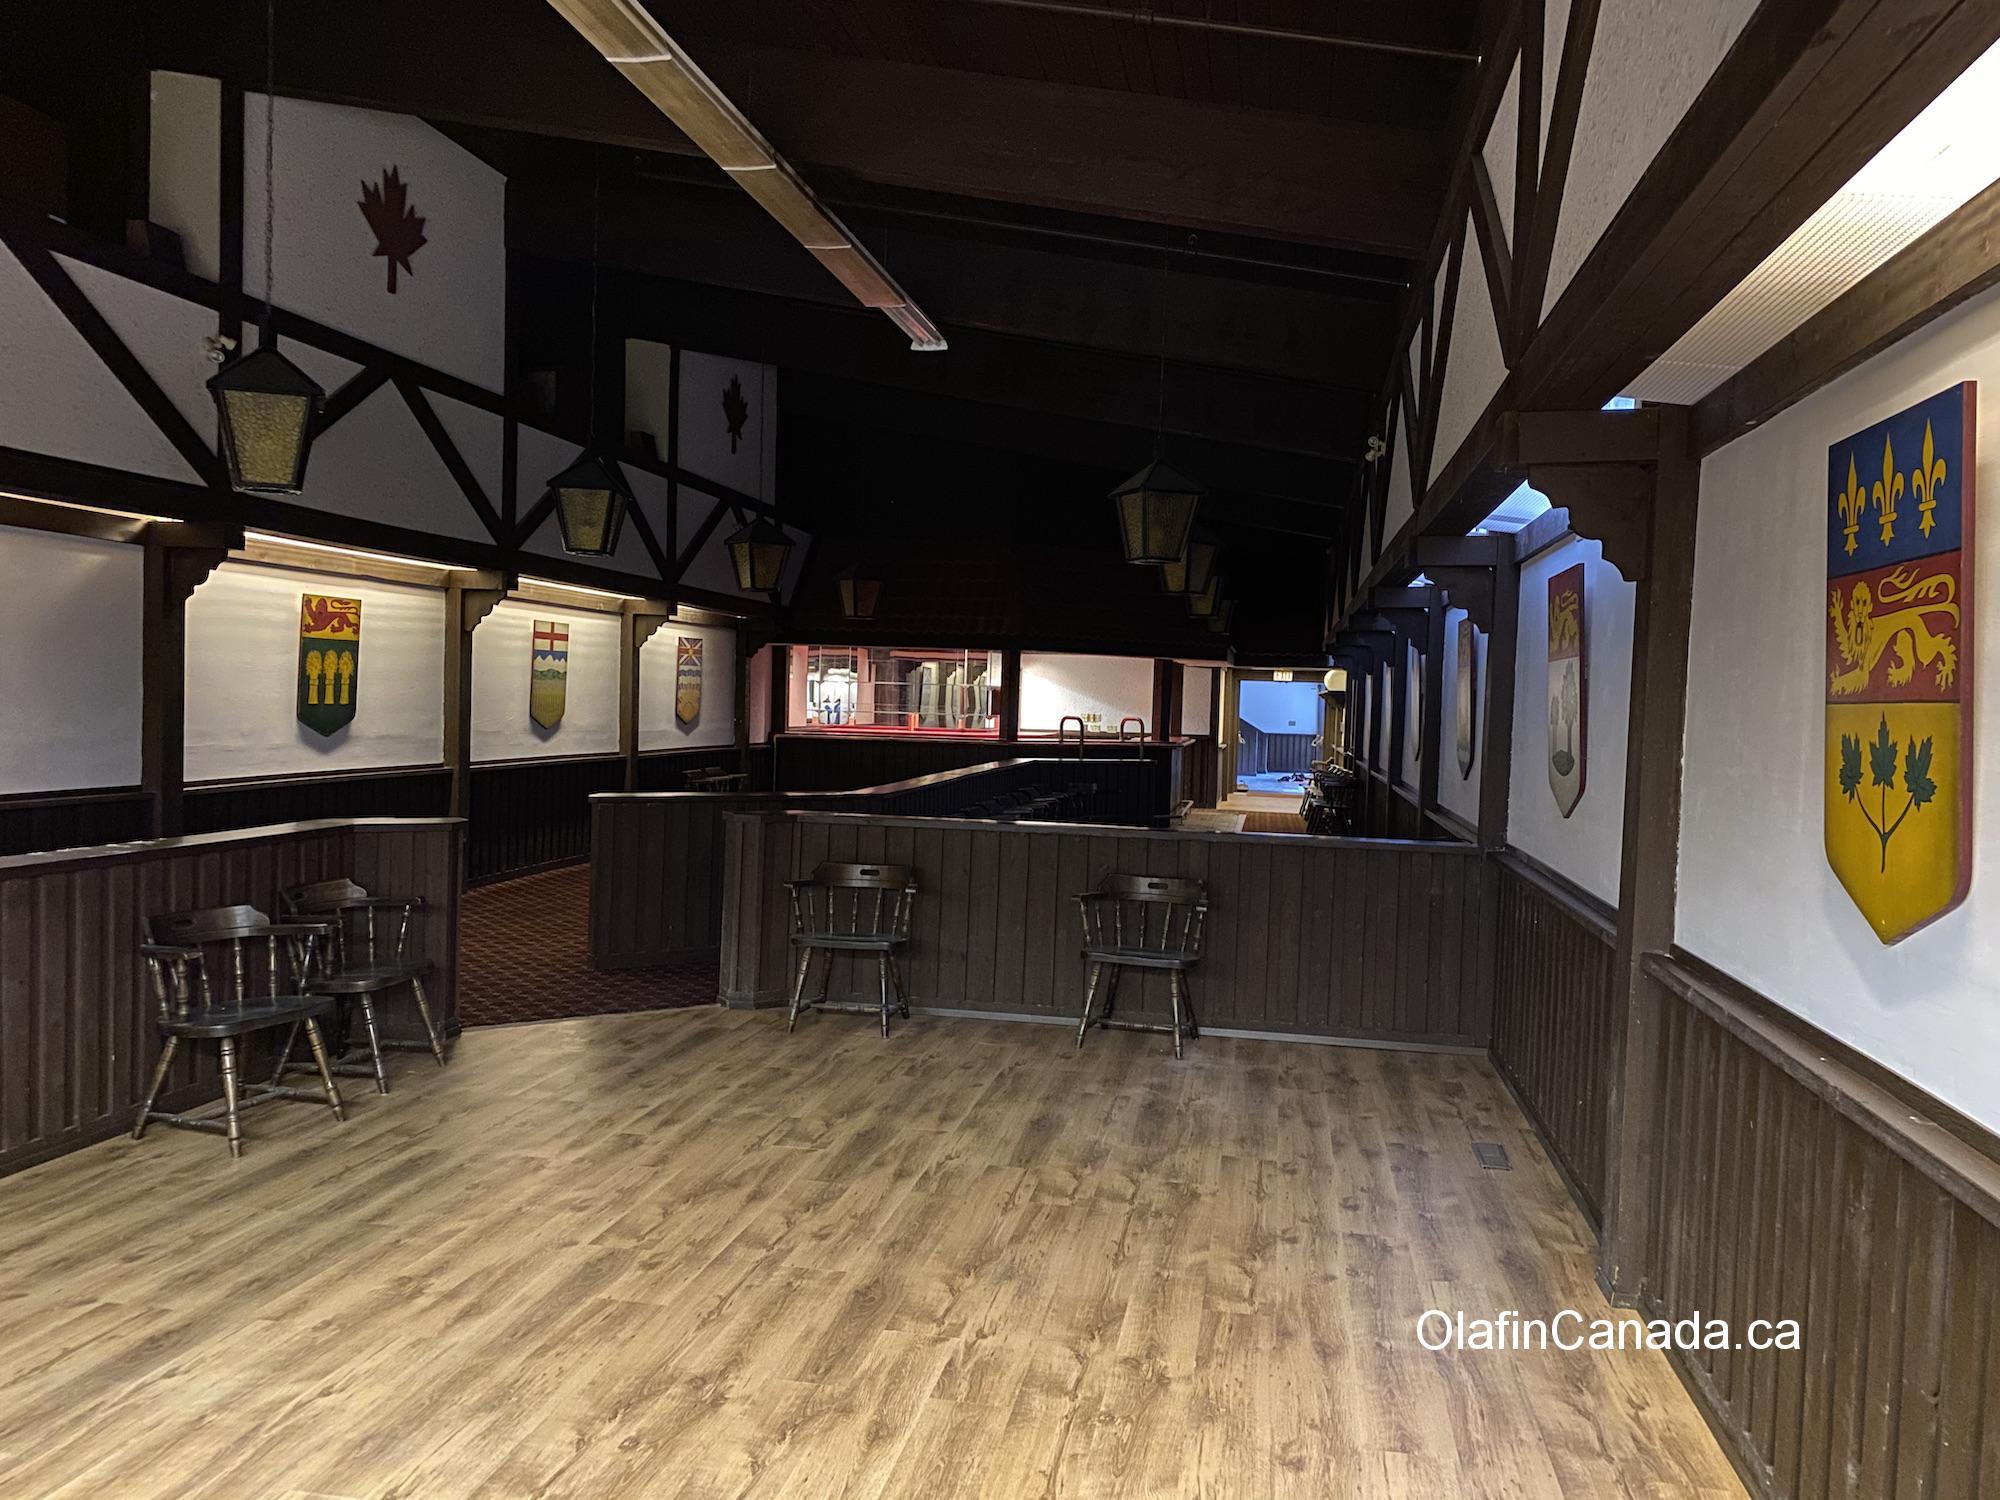 Dance floor in the Maple Leaf pub in Kitsault #olafincanada #britishcolumbia #discoverbc #abandonedbc #kitsault #pub